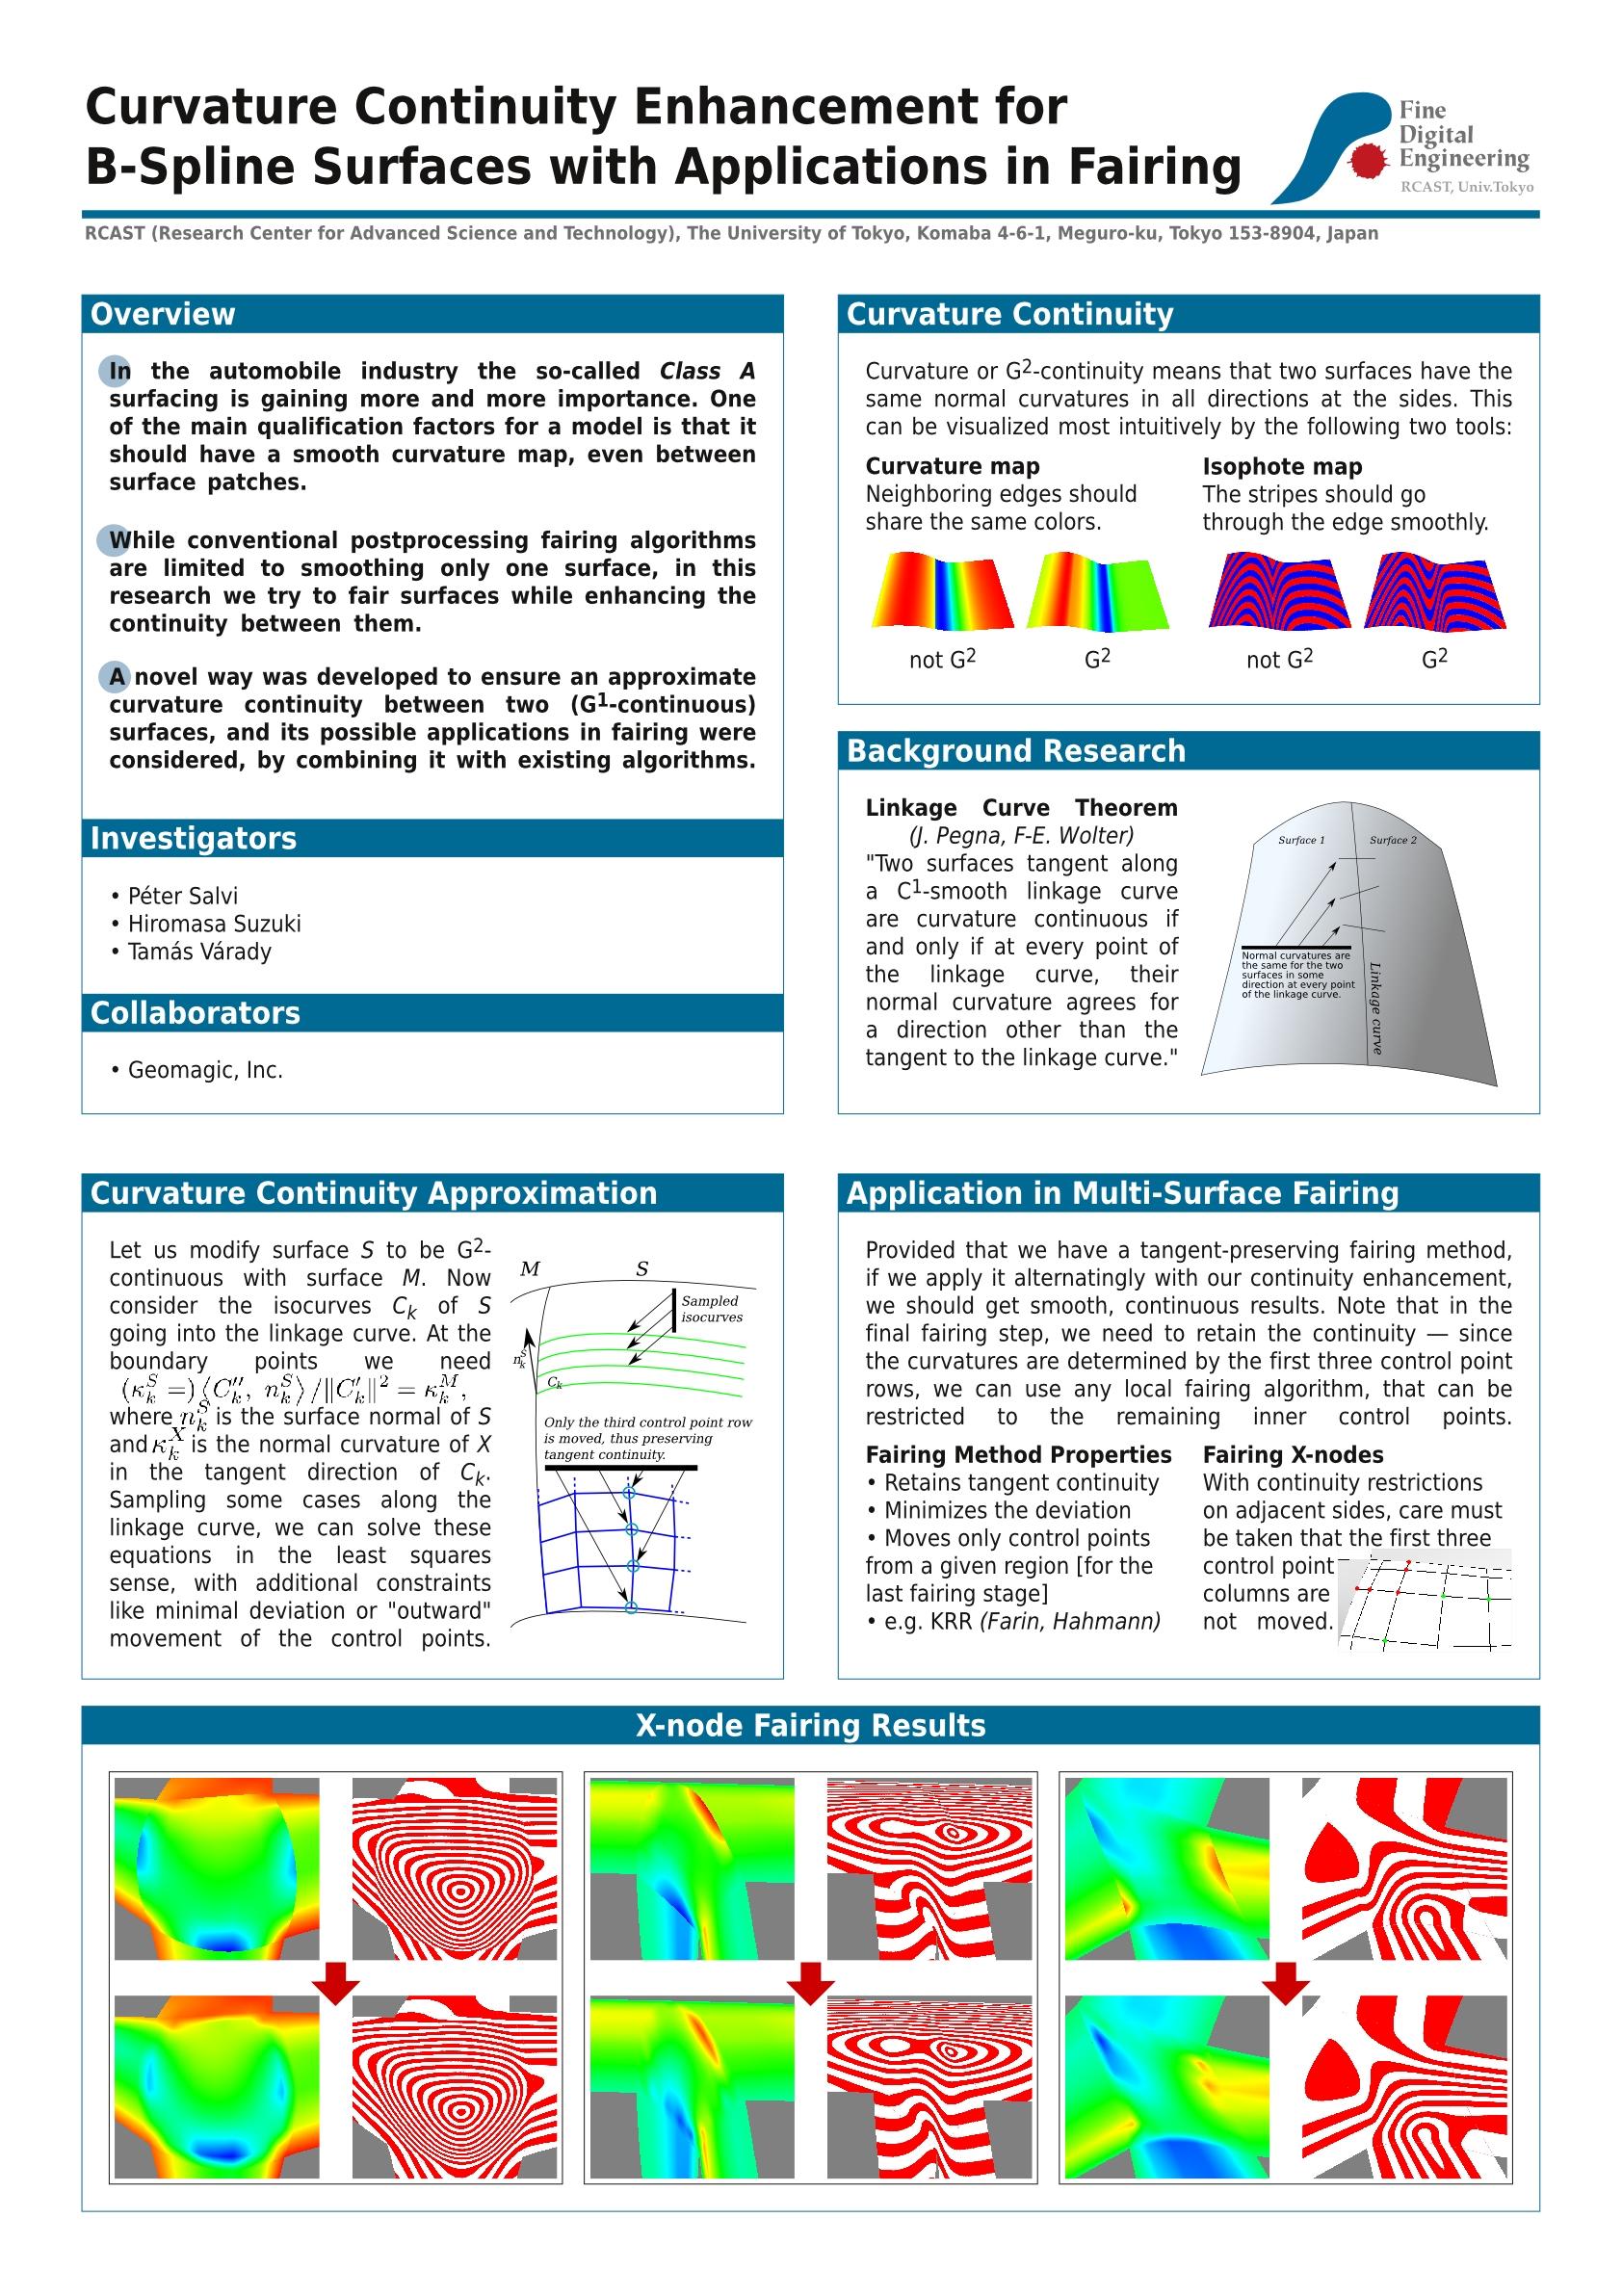 introduction to attic greek mastronarde pdf